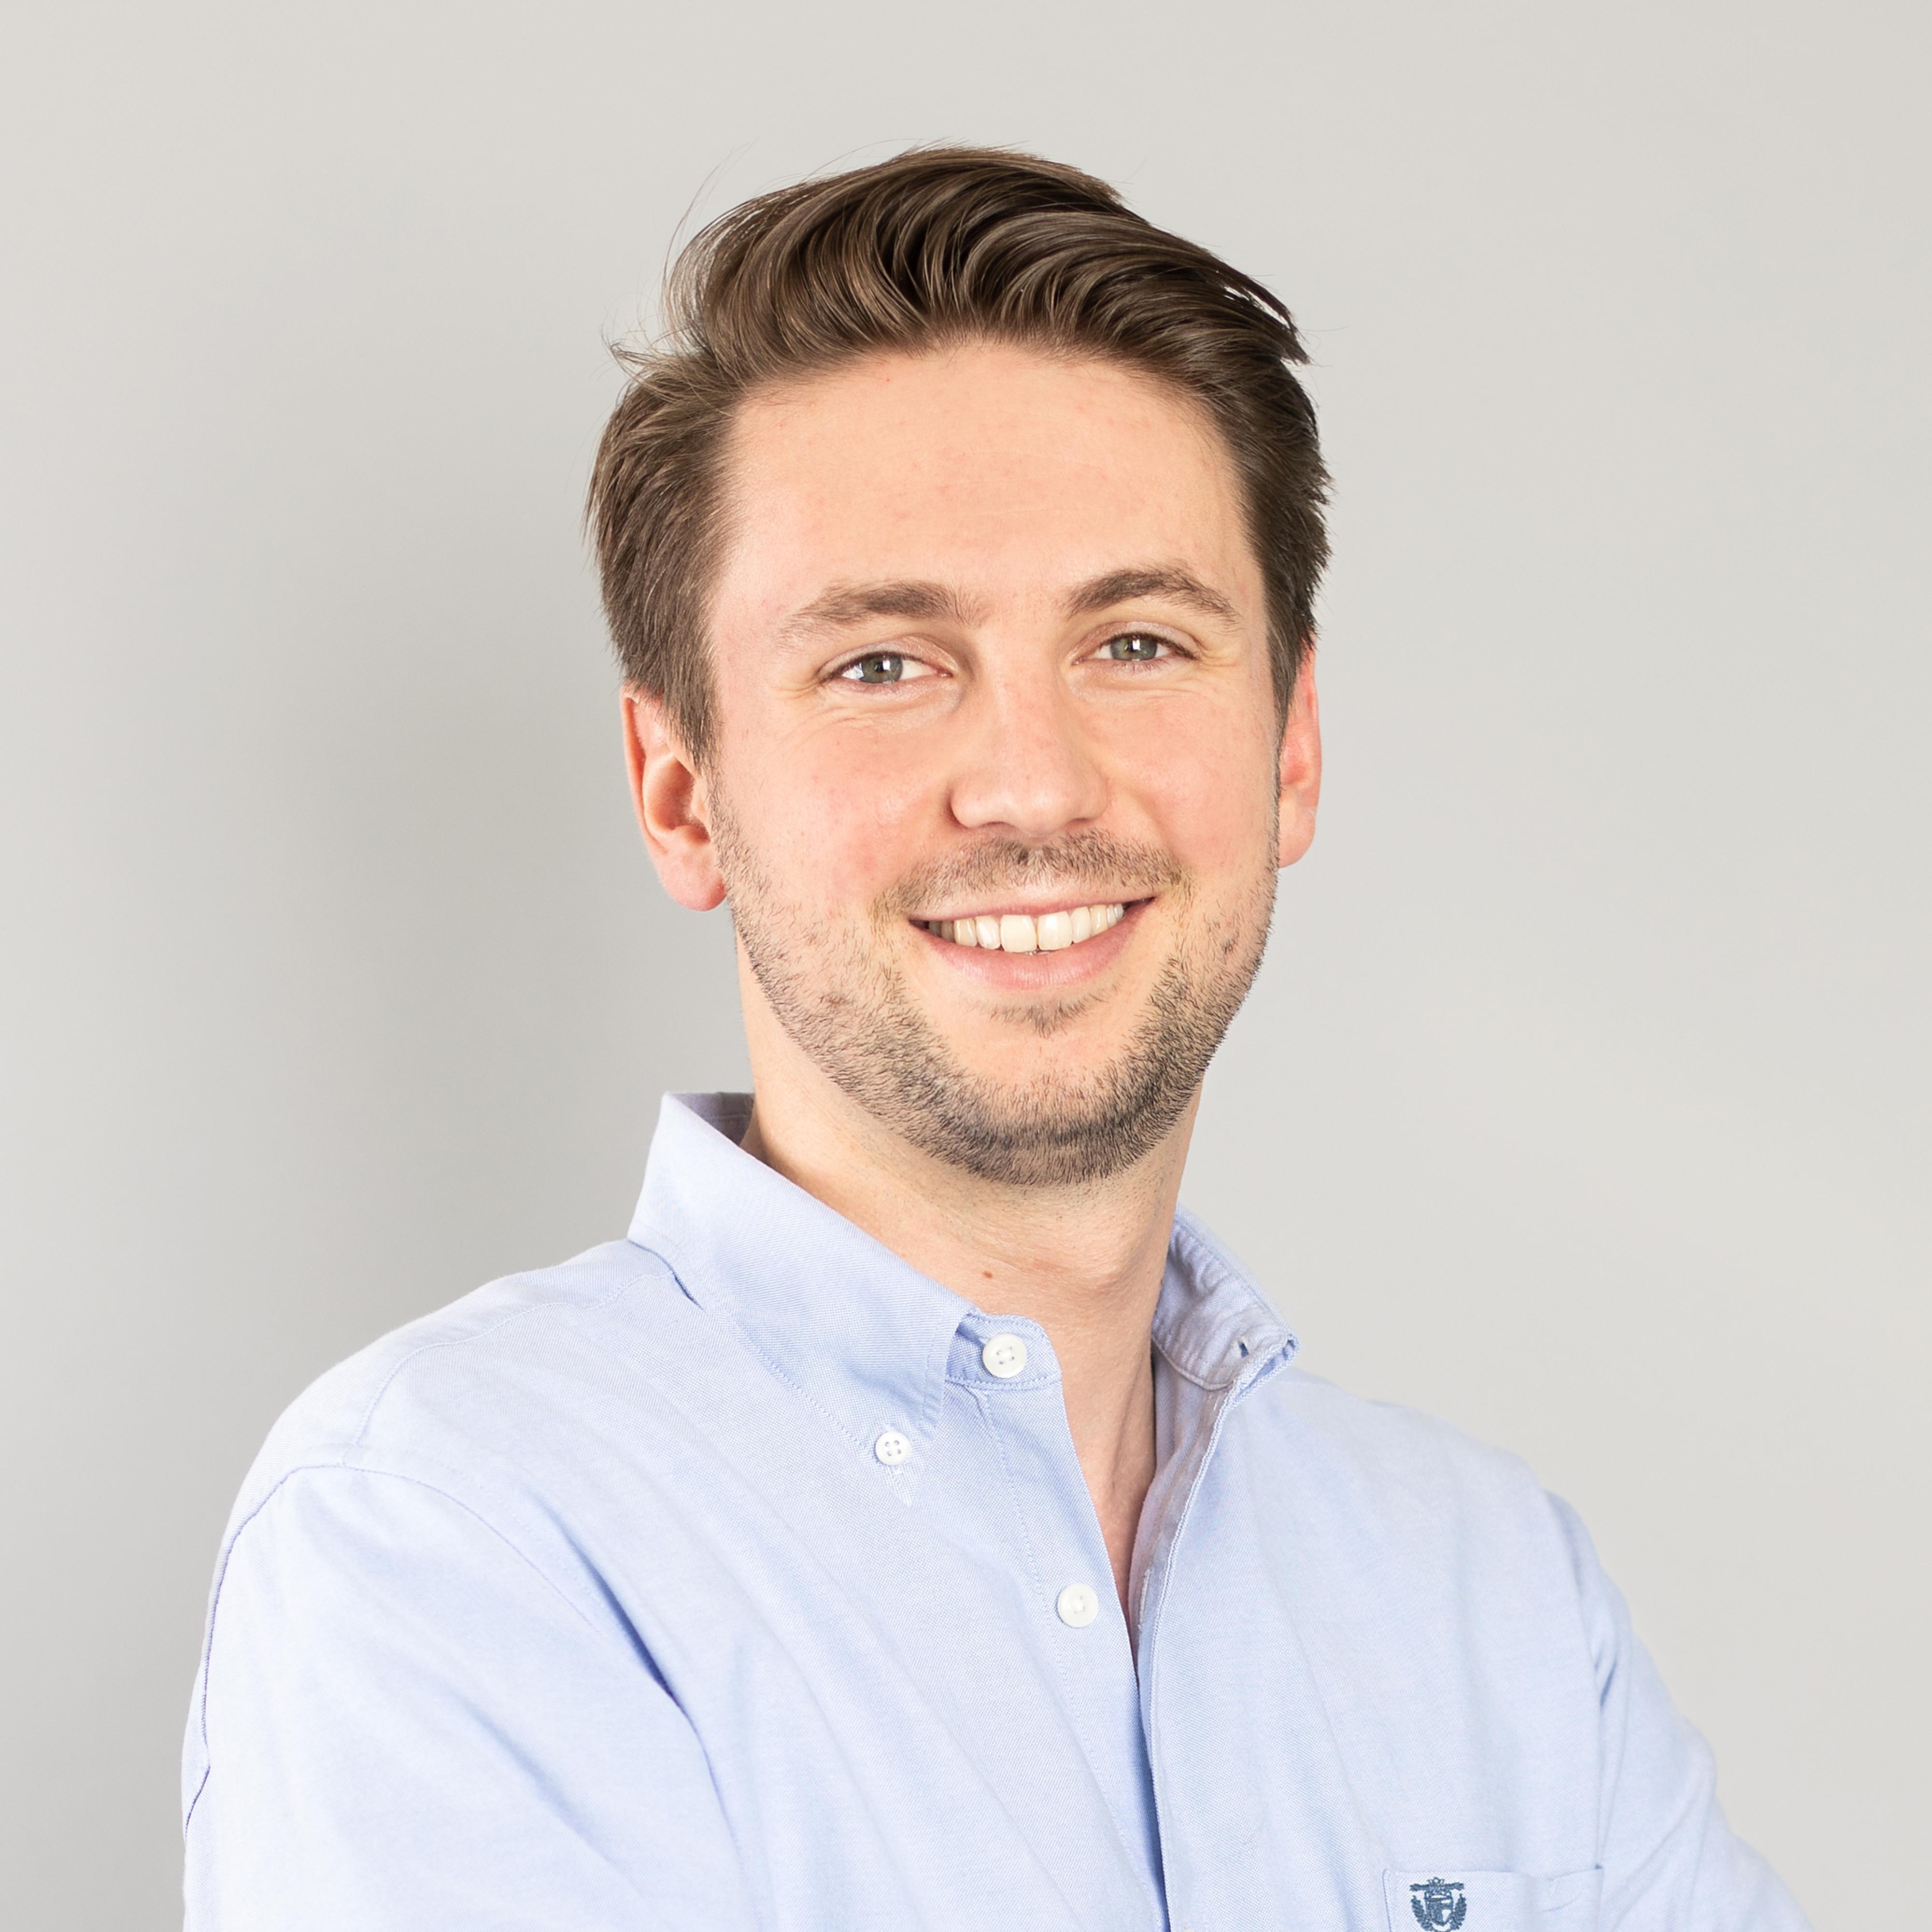 Matthias Klauser